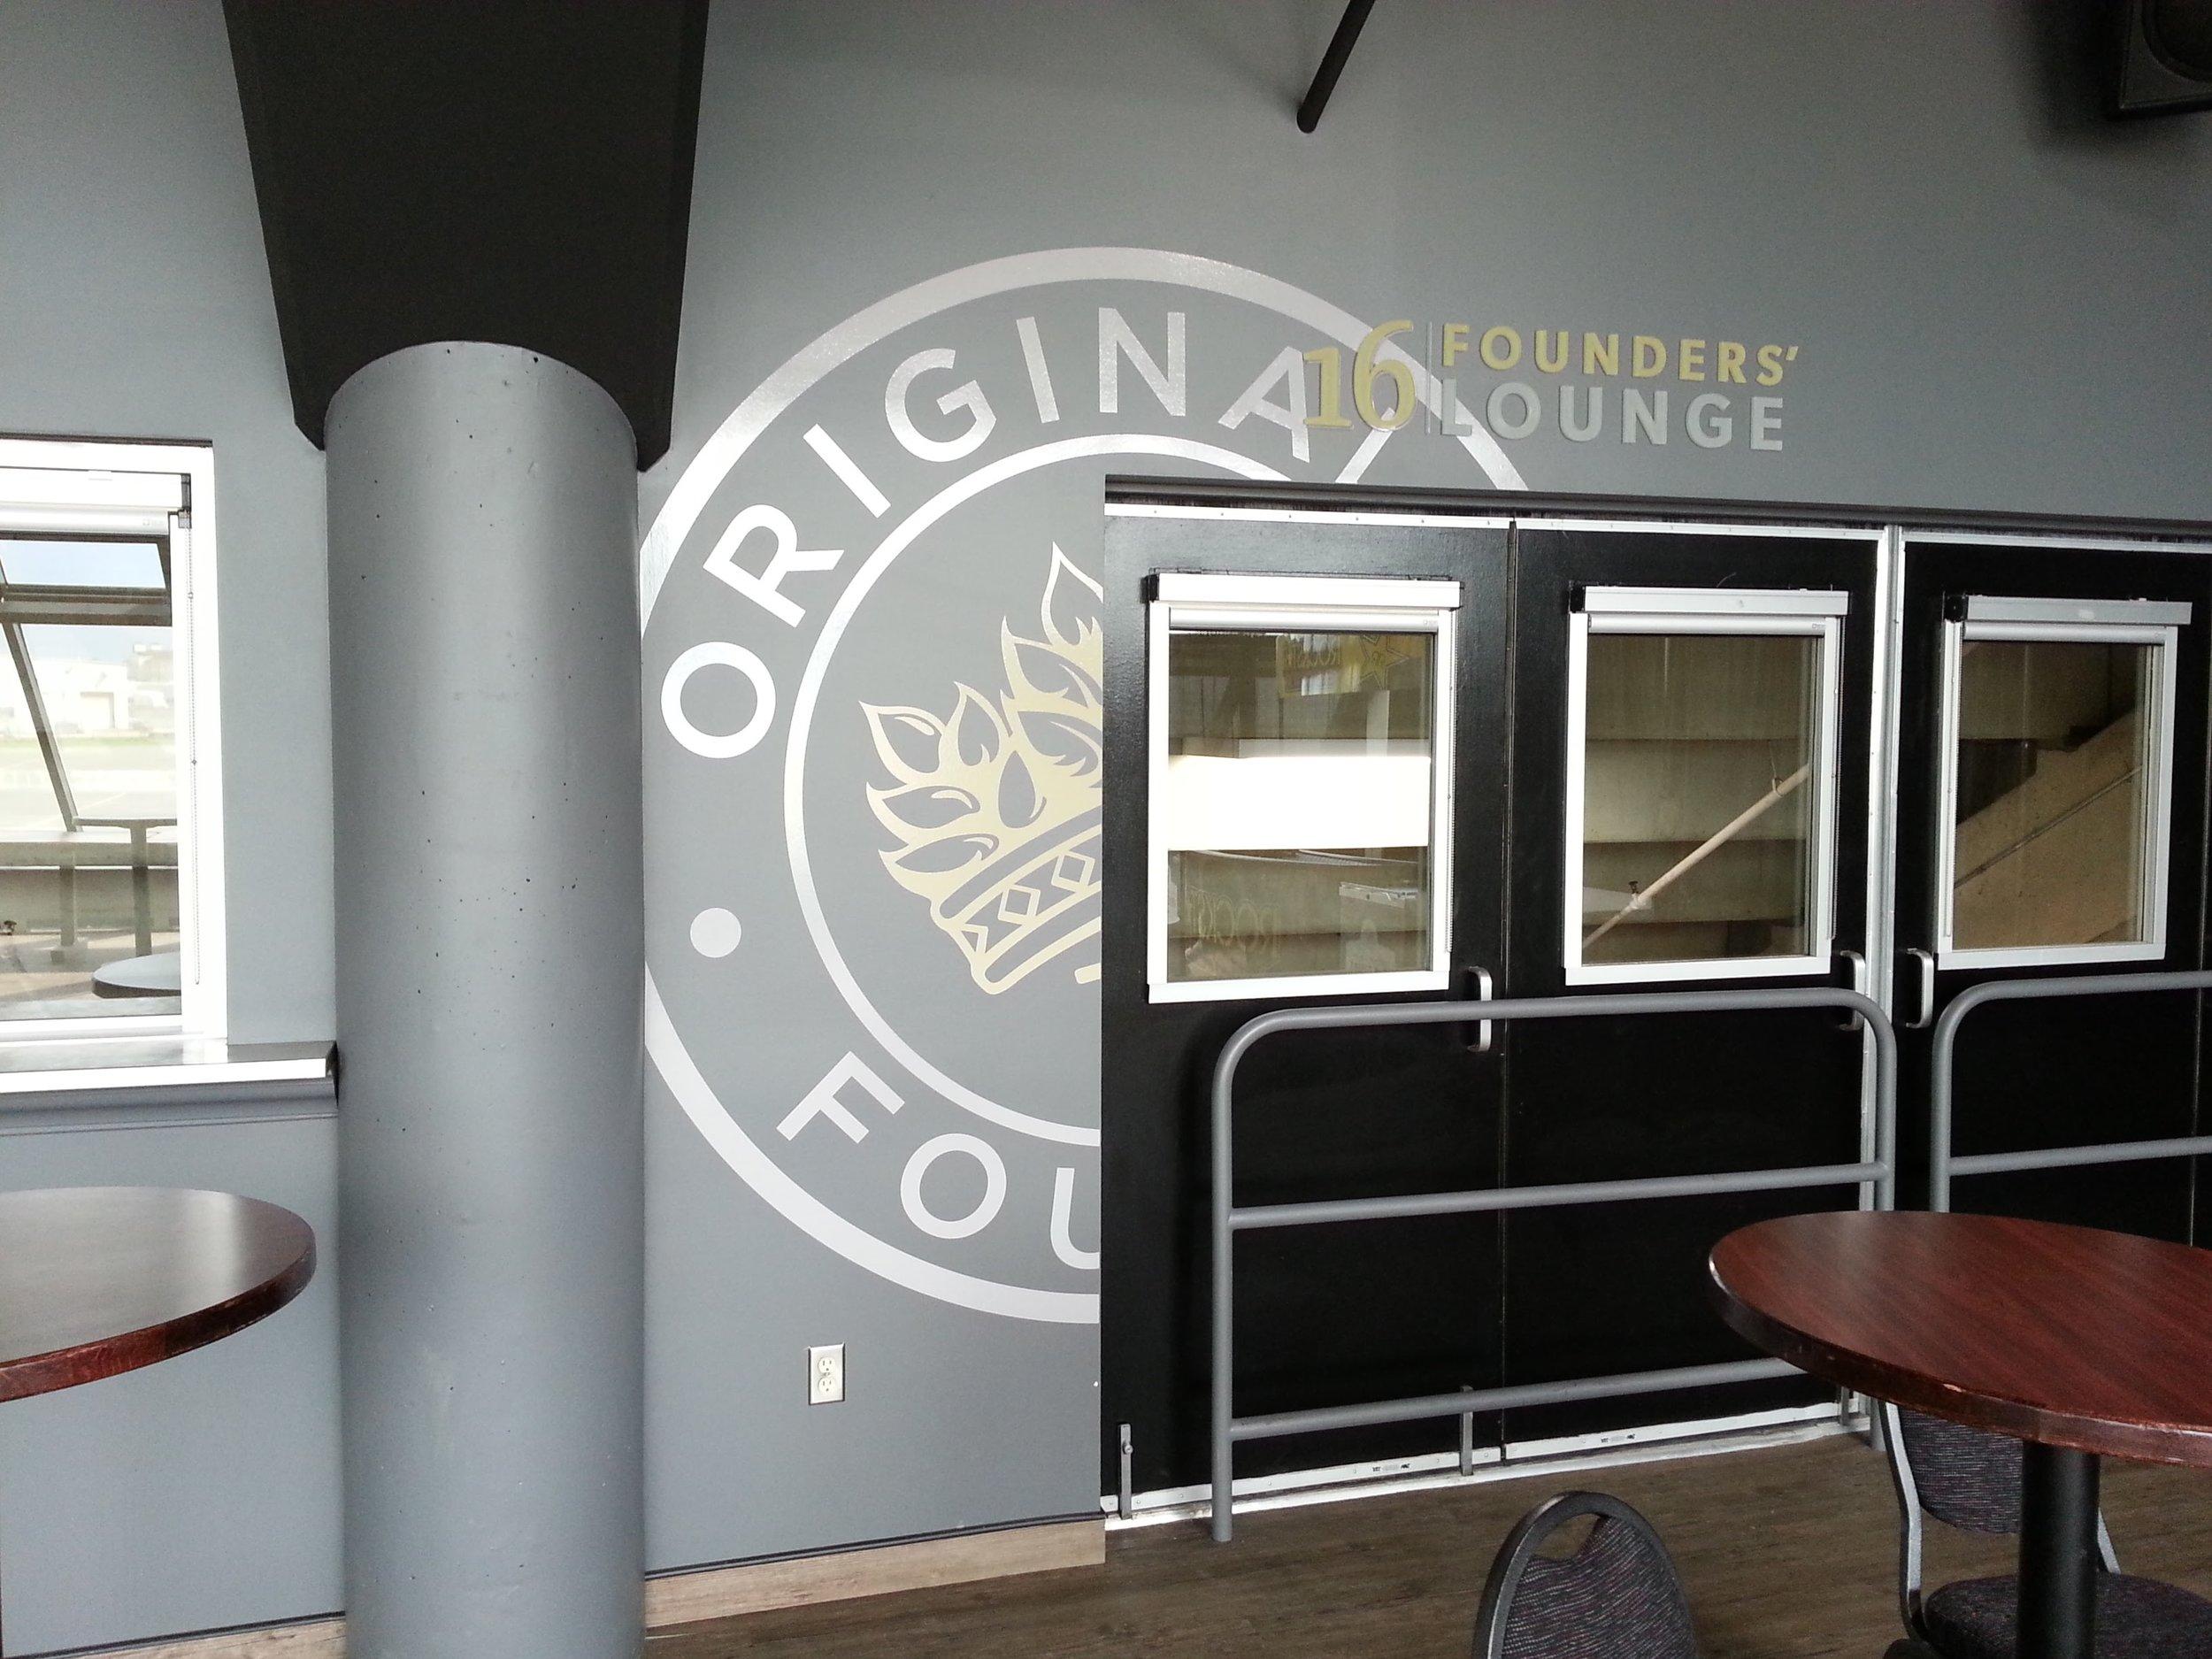 16 Founders' Lounge, Sasktel Centre